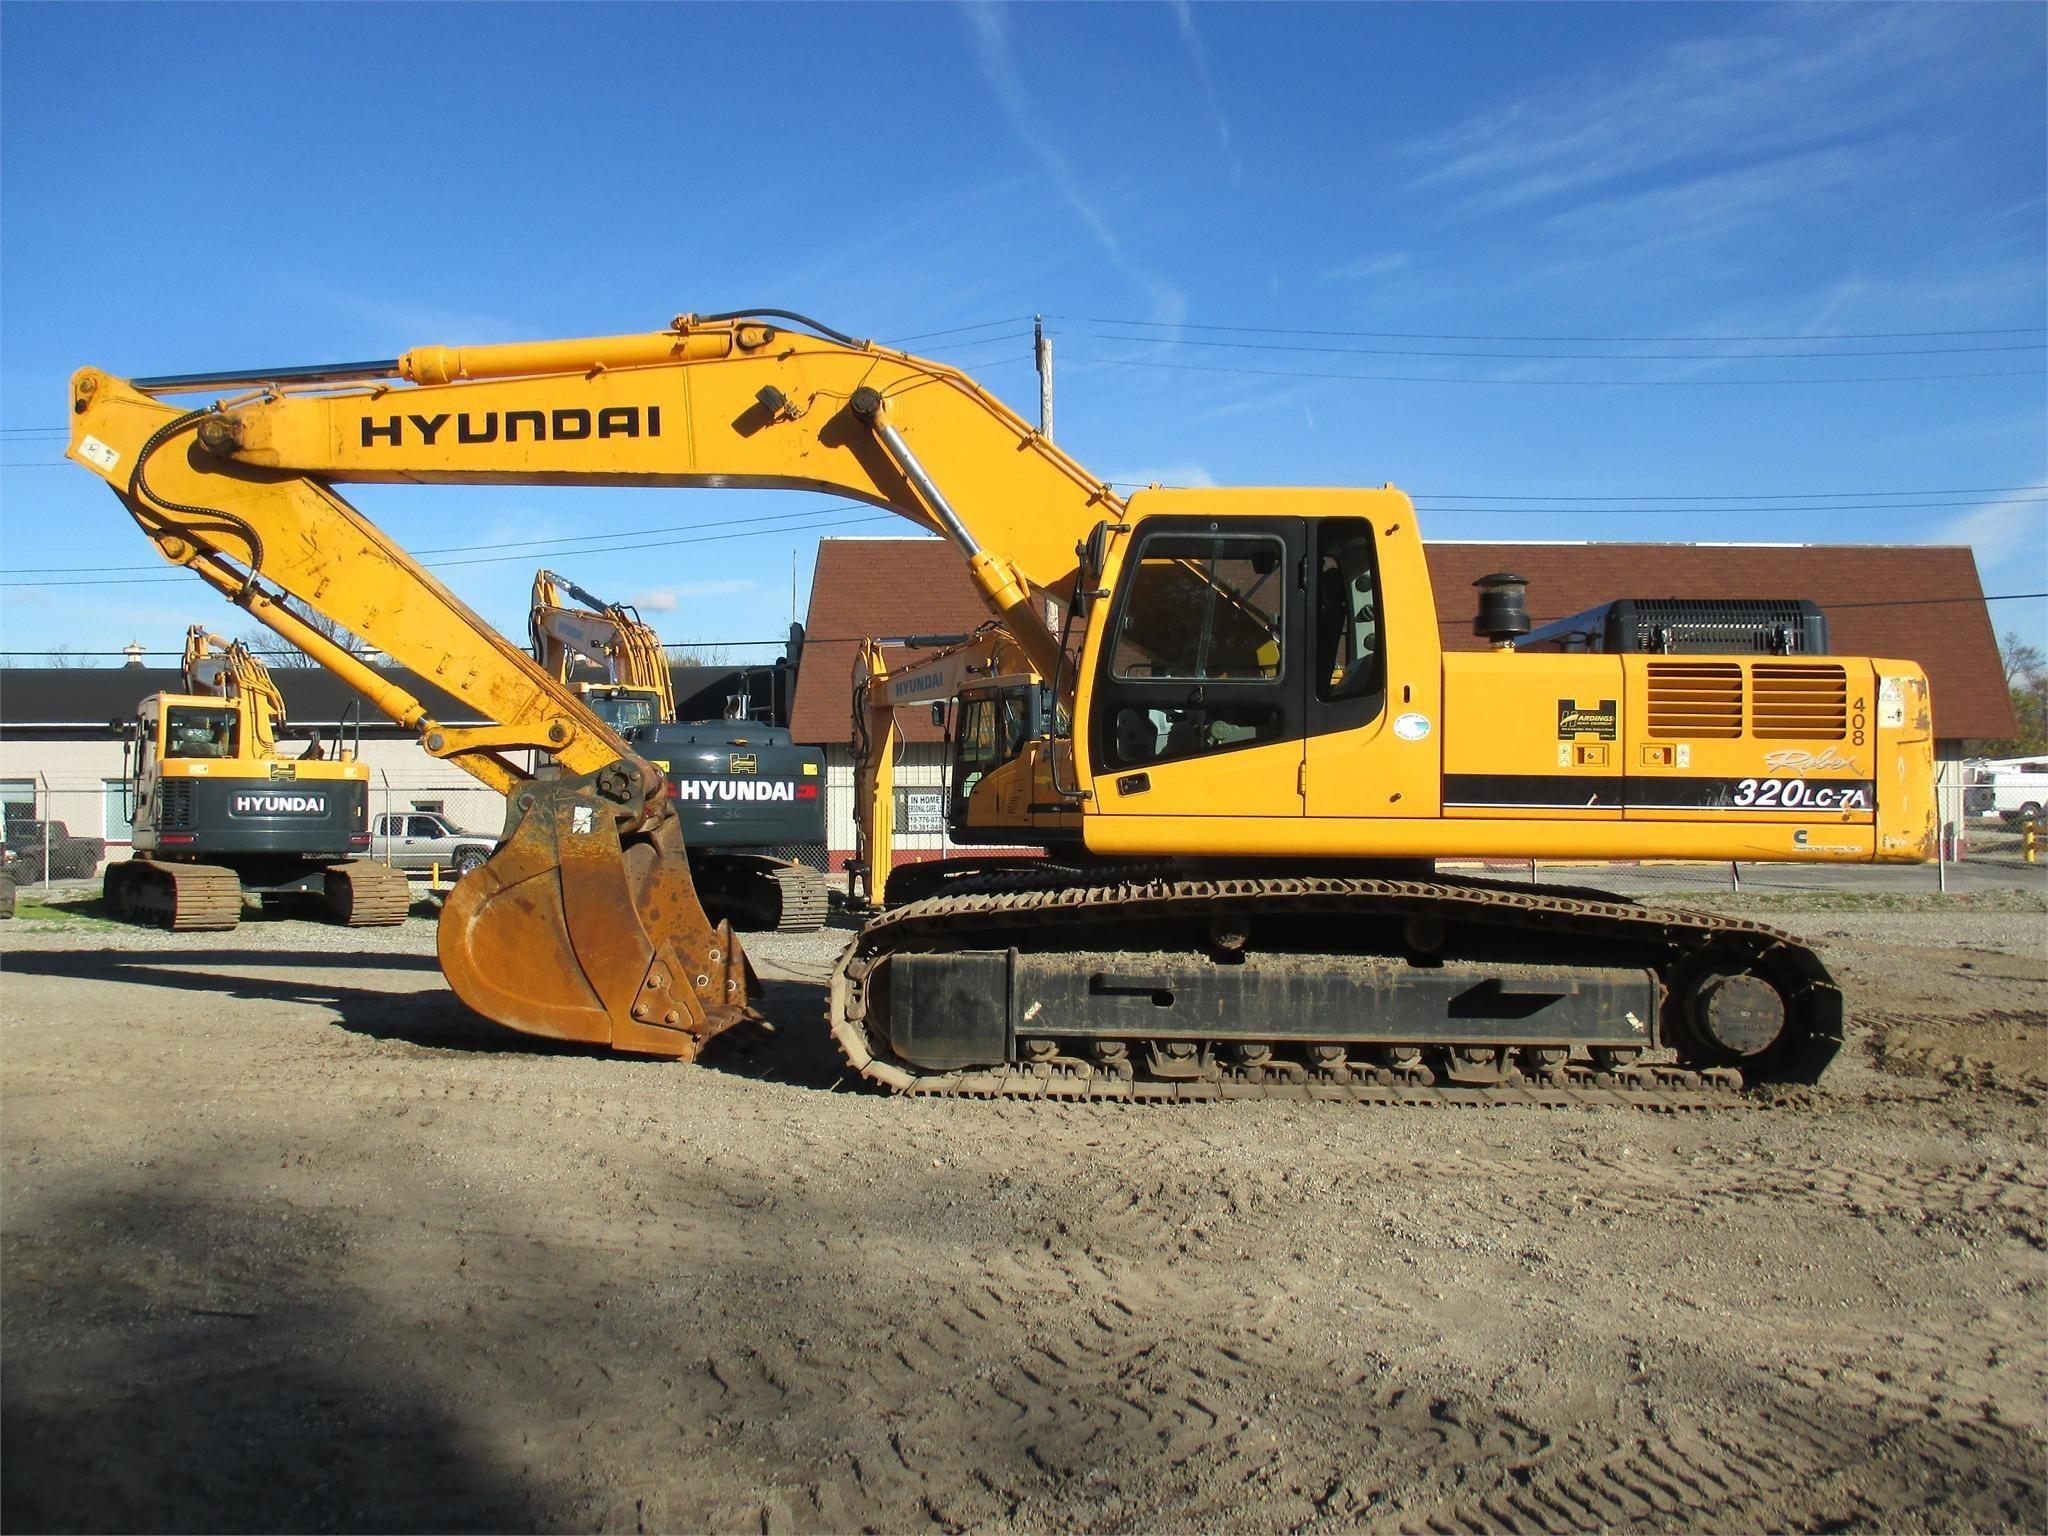 Used, 2007, HYUNDAI, ROBEX 320 LC-7A, Excavators - Crawler